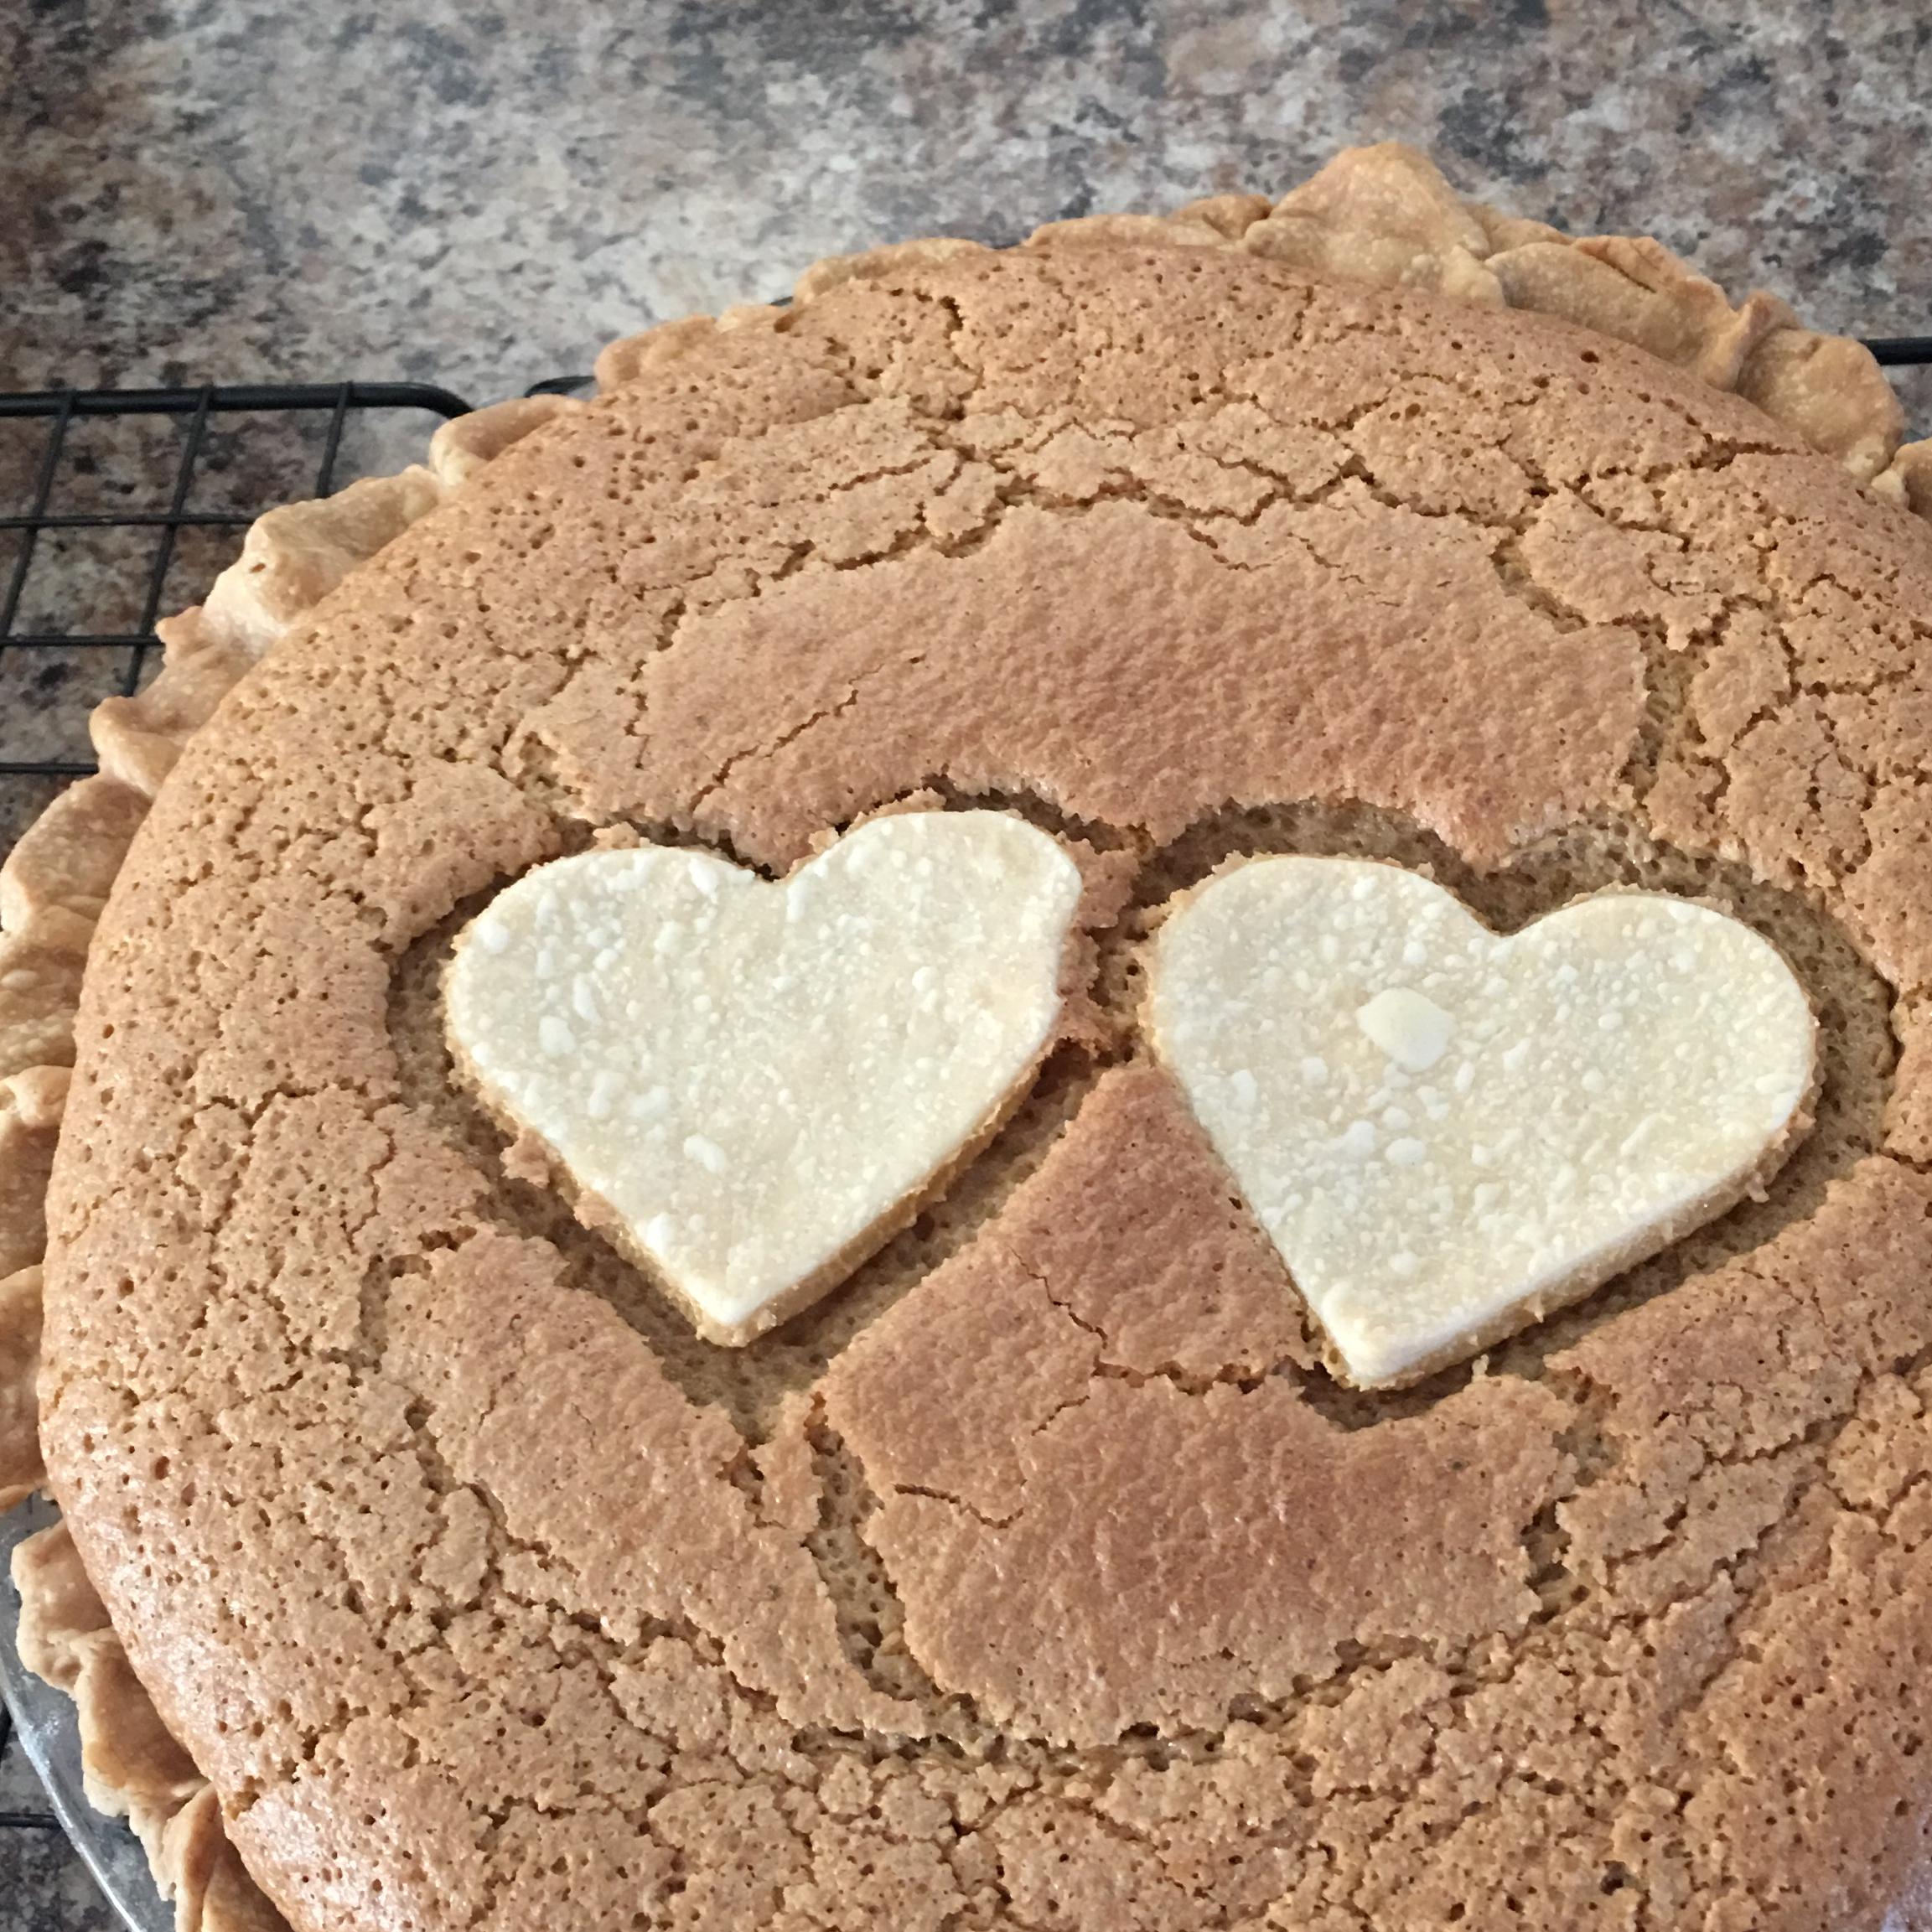 Quebec City Sugar Pie with Thick Cream image